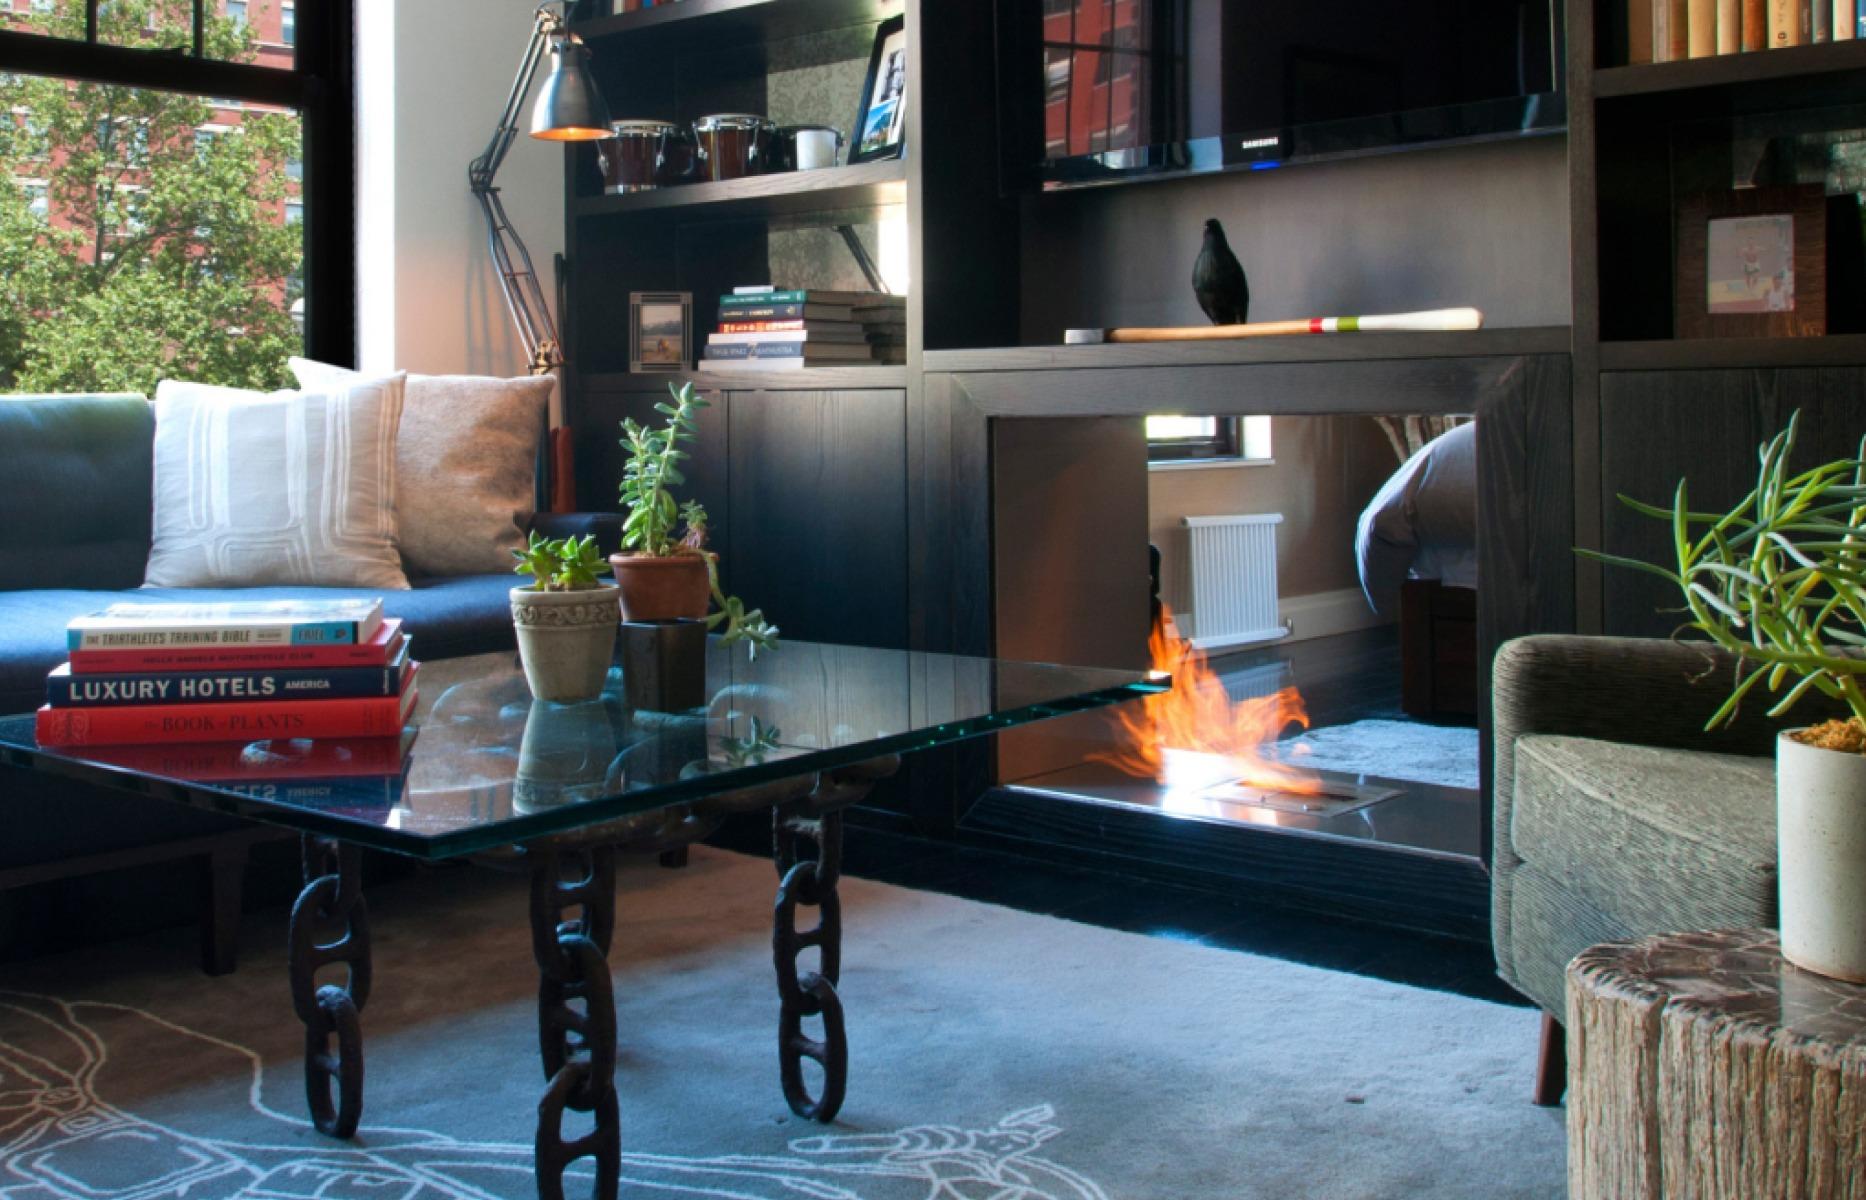 EcoSmart Fire Double sided fireplace